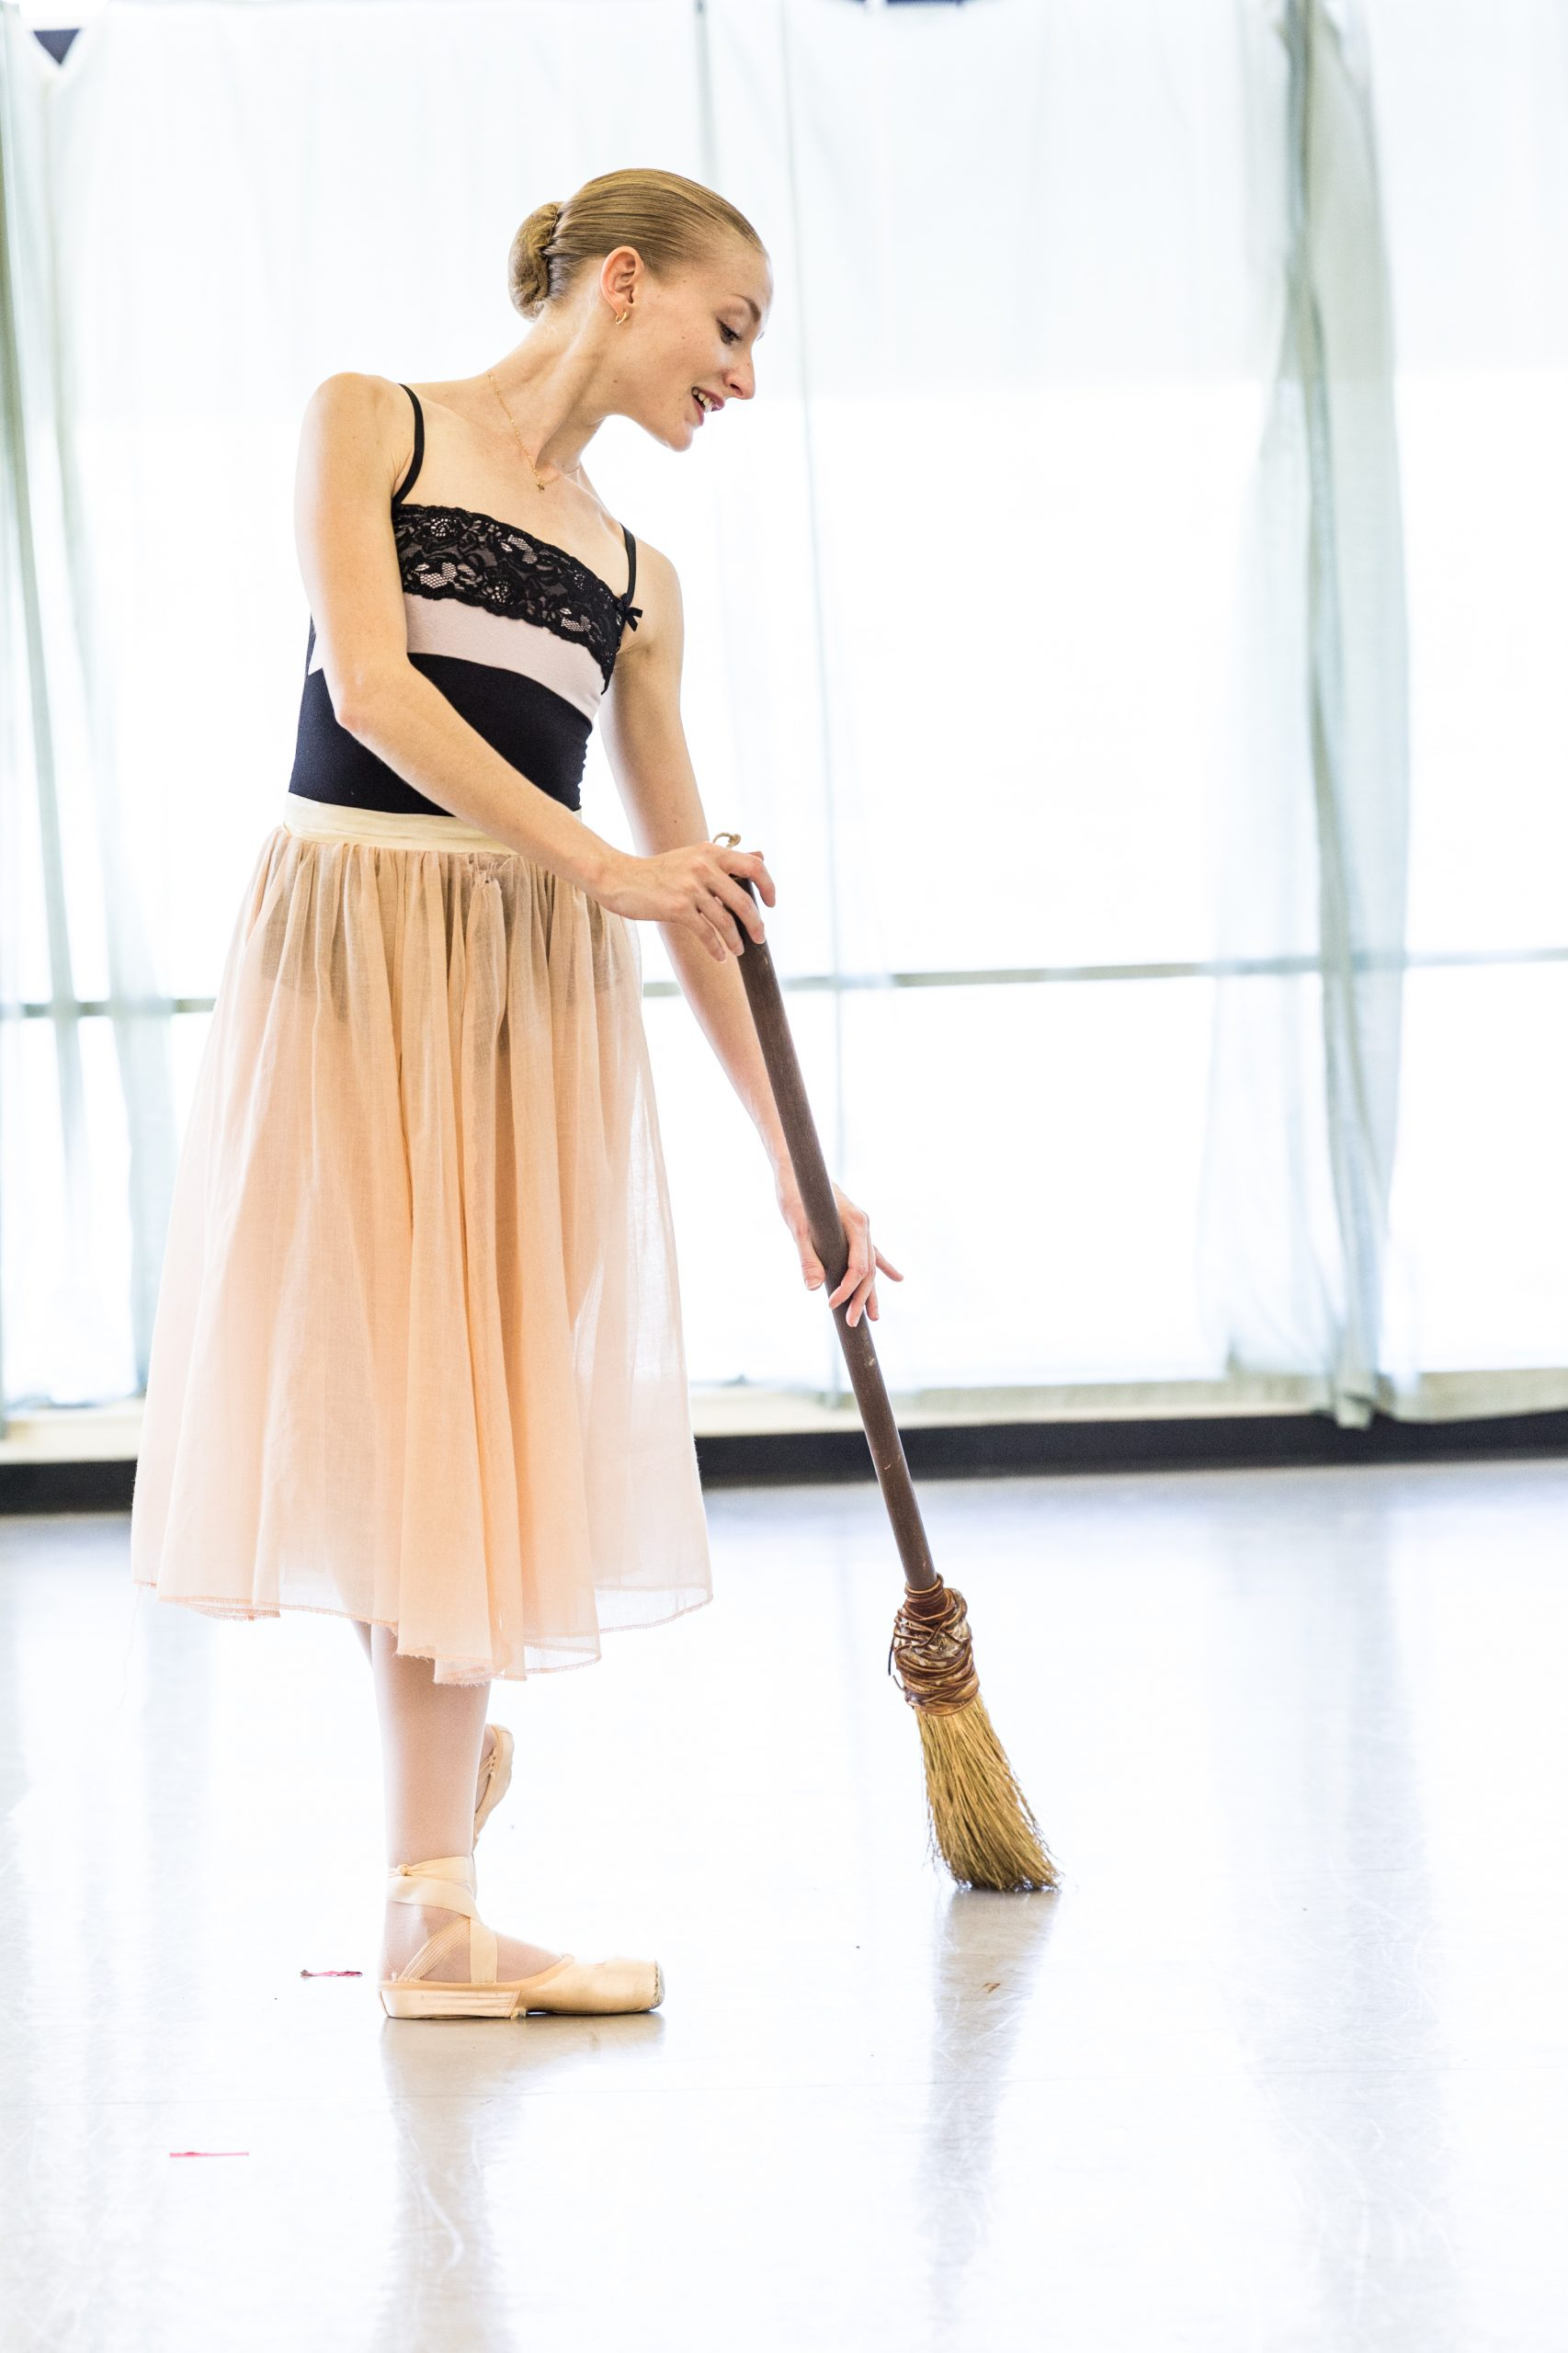 Principal Ballerina Sarah Pautz rehearsing Cinderella. Photo by Joel Spring, RxDesign.com.